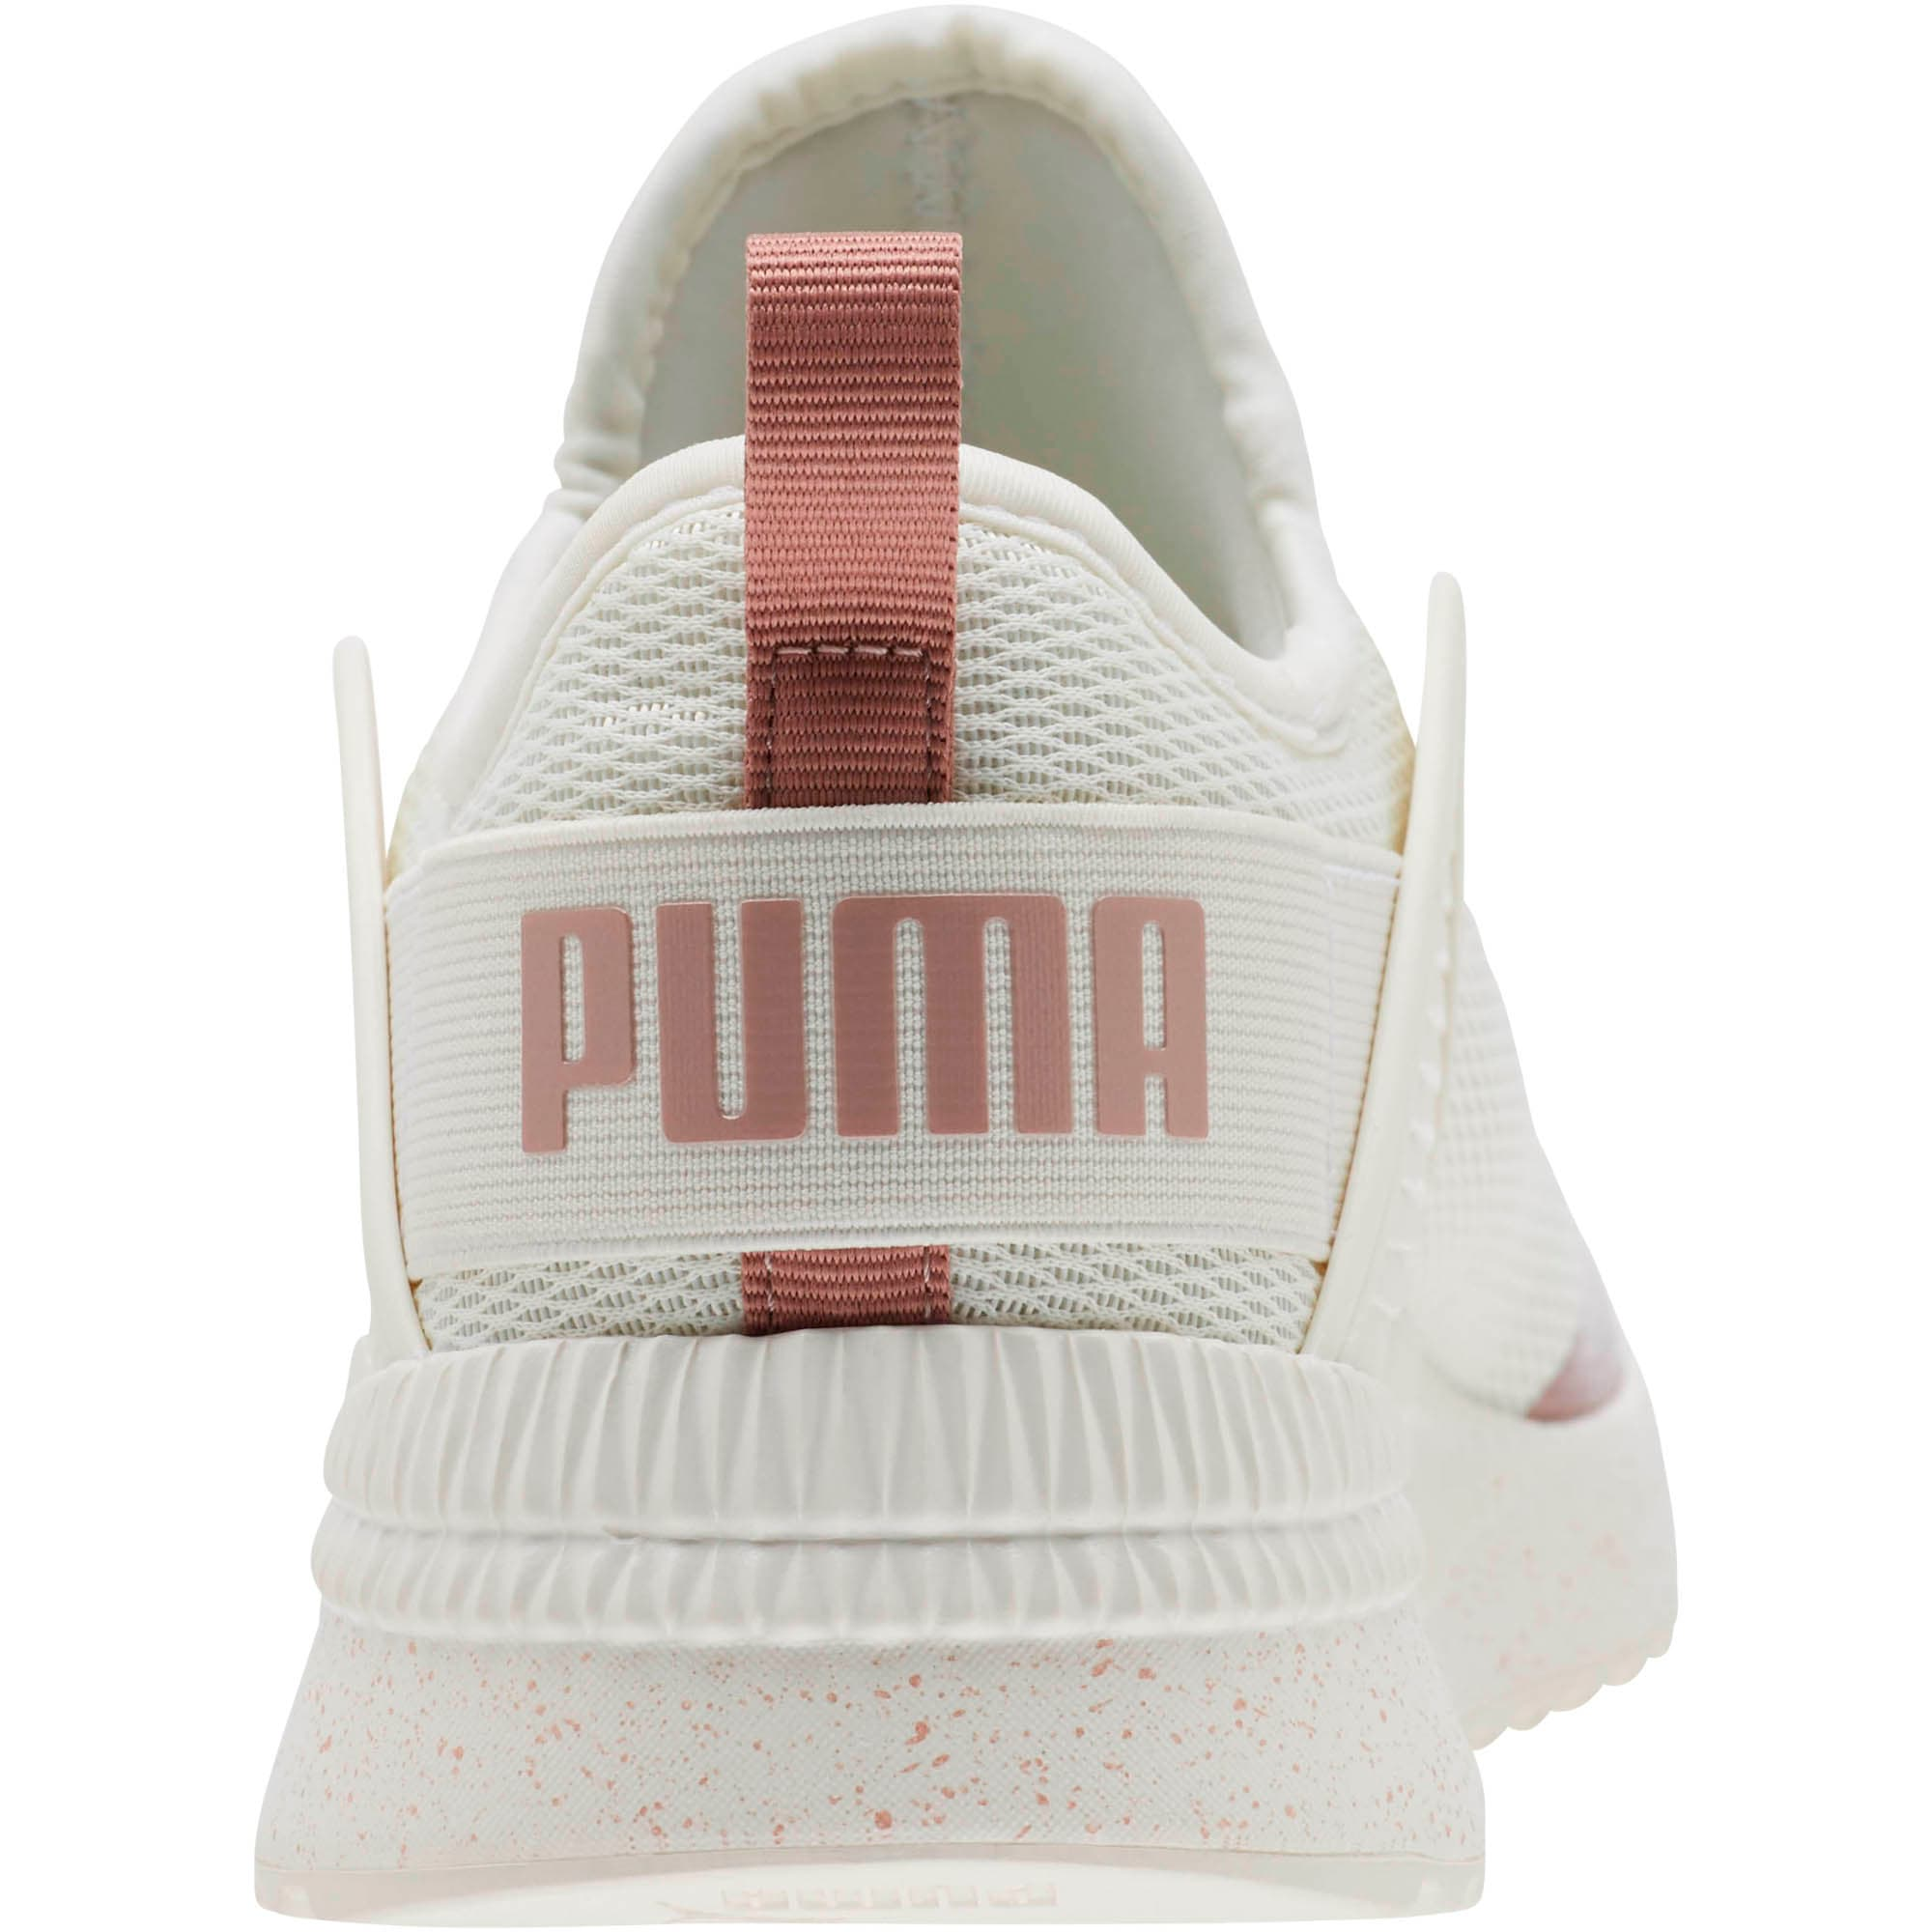 Thumbnail 4 of Pacer Nex tCage Metallic Speckle Women's Sneakers, Whisper White-Rose Gold, medium